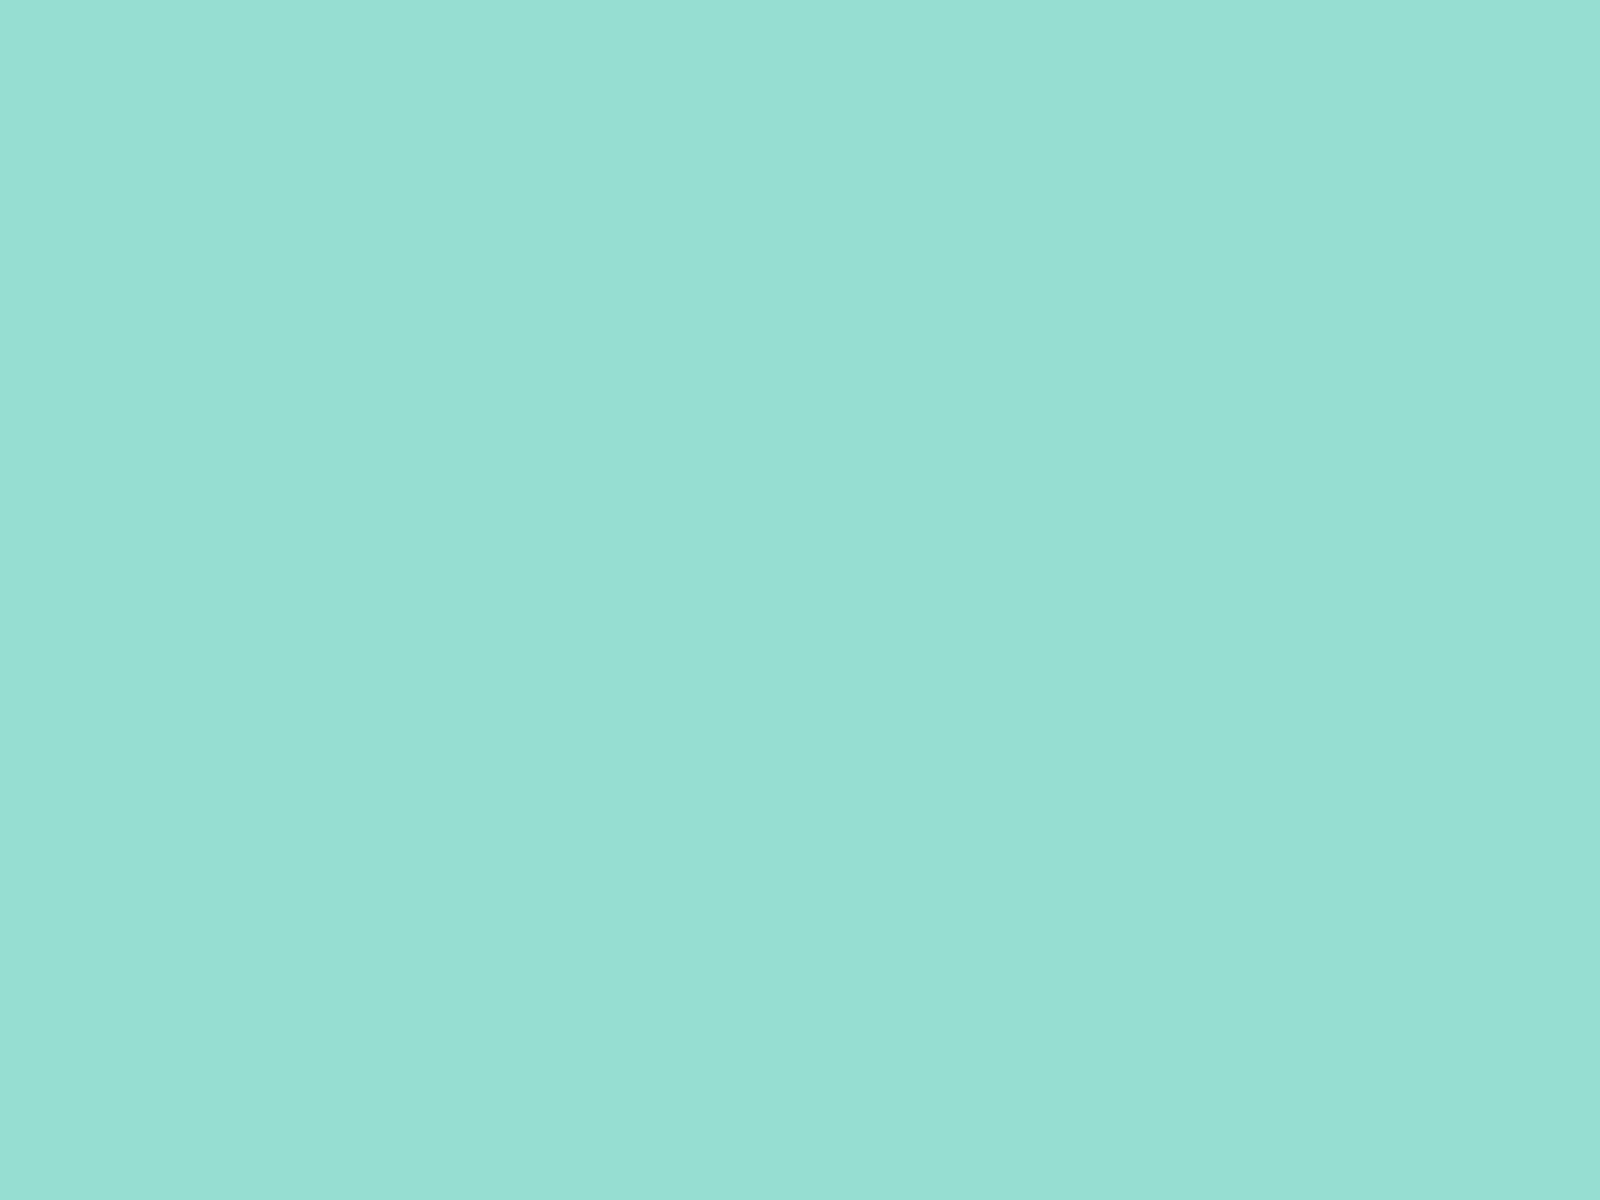 1600x1200 Pale Robin Egg Blue Solid Color Background